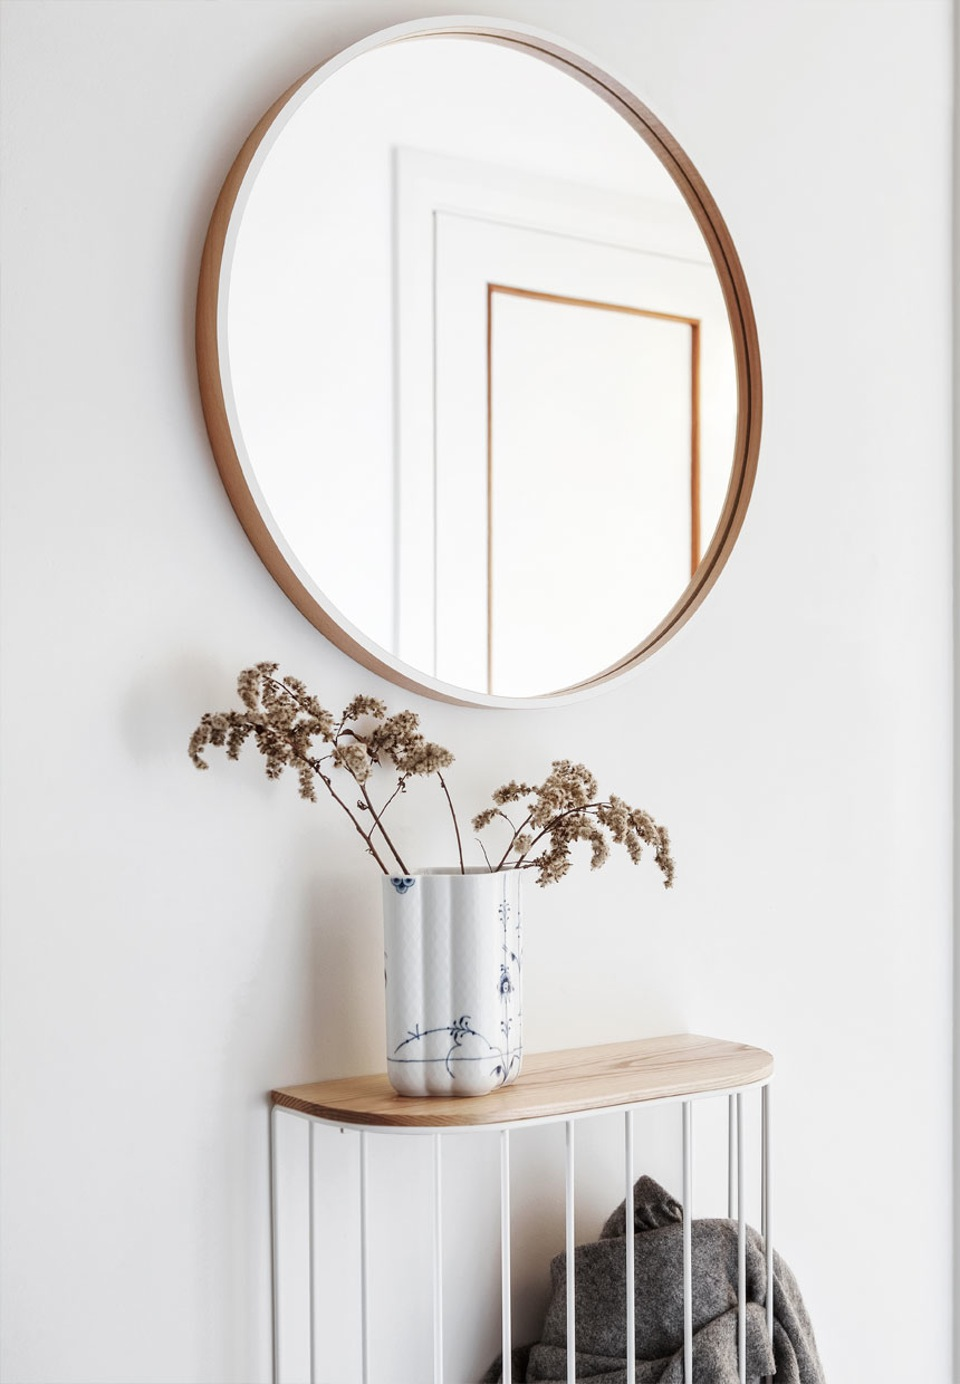 entre-trae-rundt-spejl-johanne-nygaard-dueholm-lejlighed-aalborg-g67orkb2sukjynileahjza